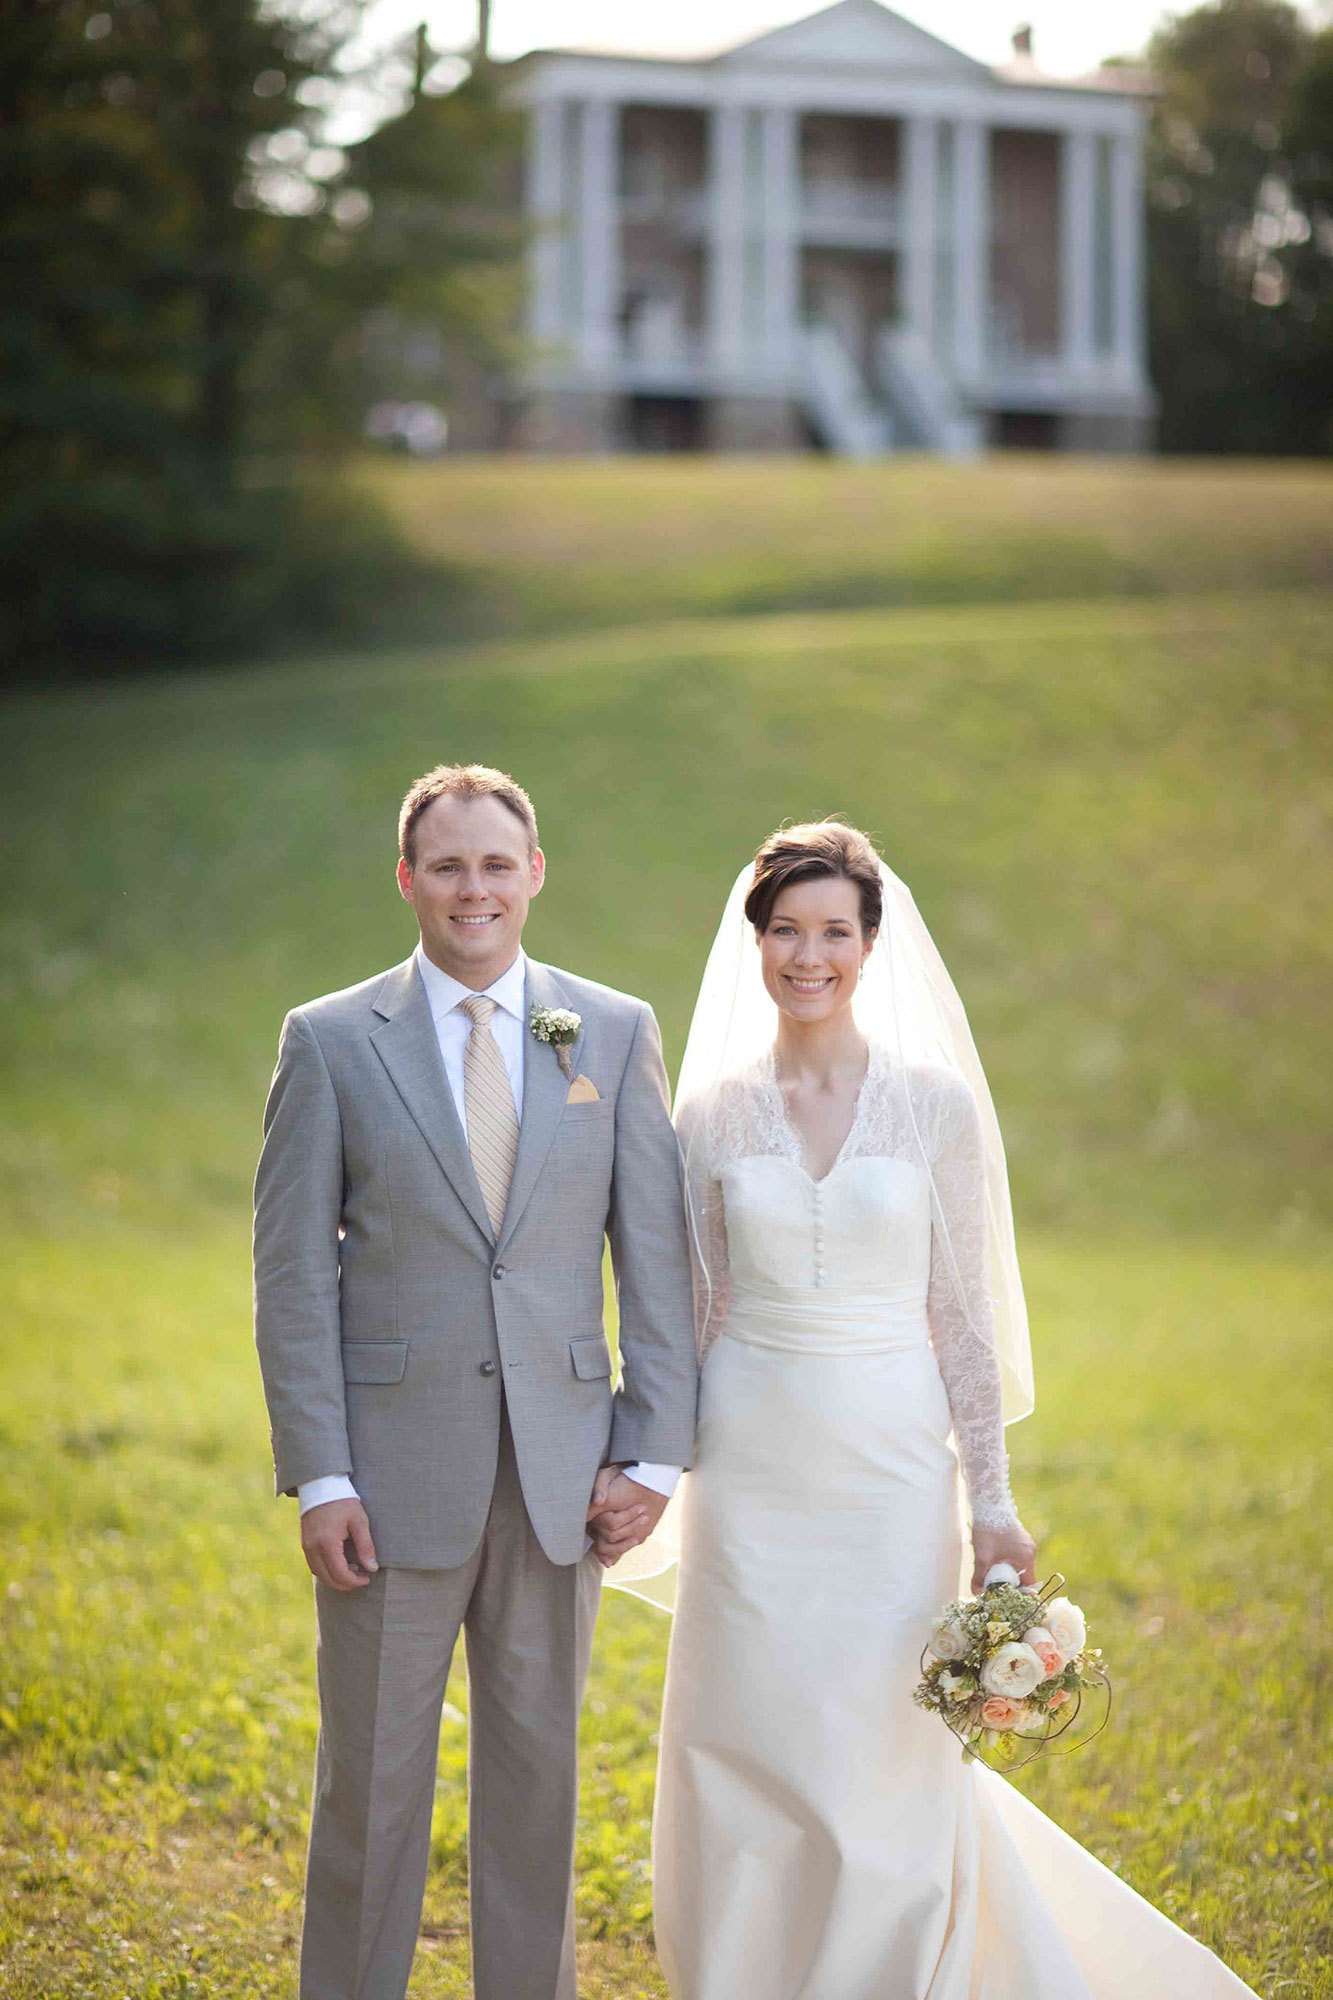 Amanda-Cowley-Willowbank-Vineyard-Bride-Photo-By-White-Photographie-031.jpg